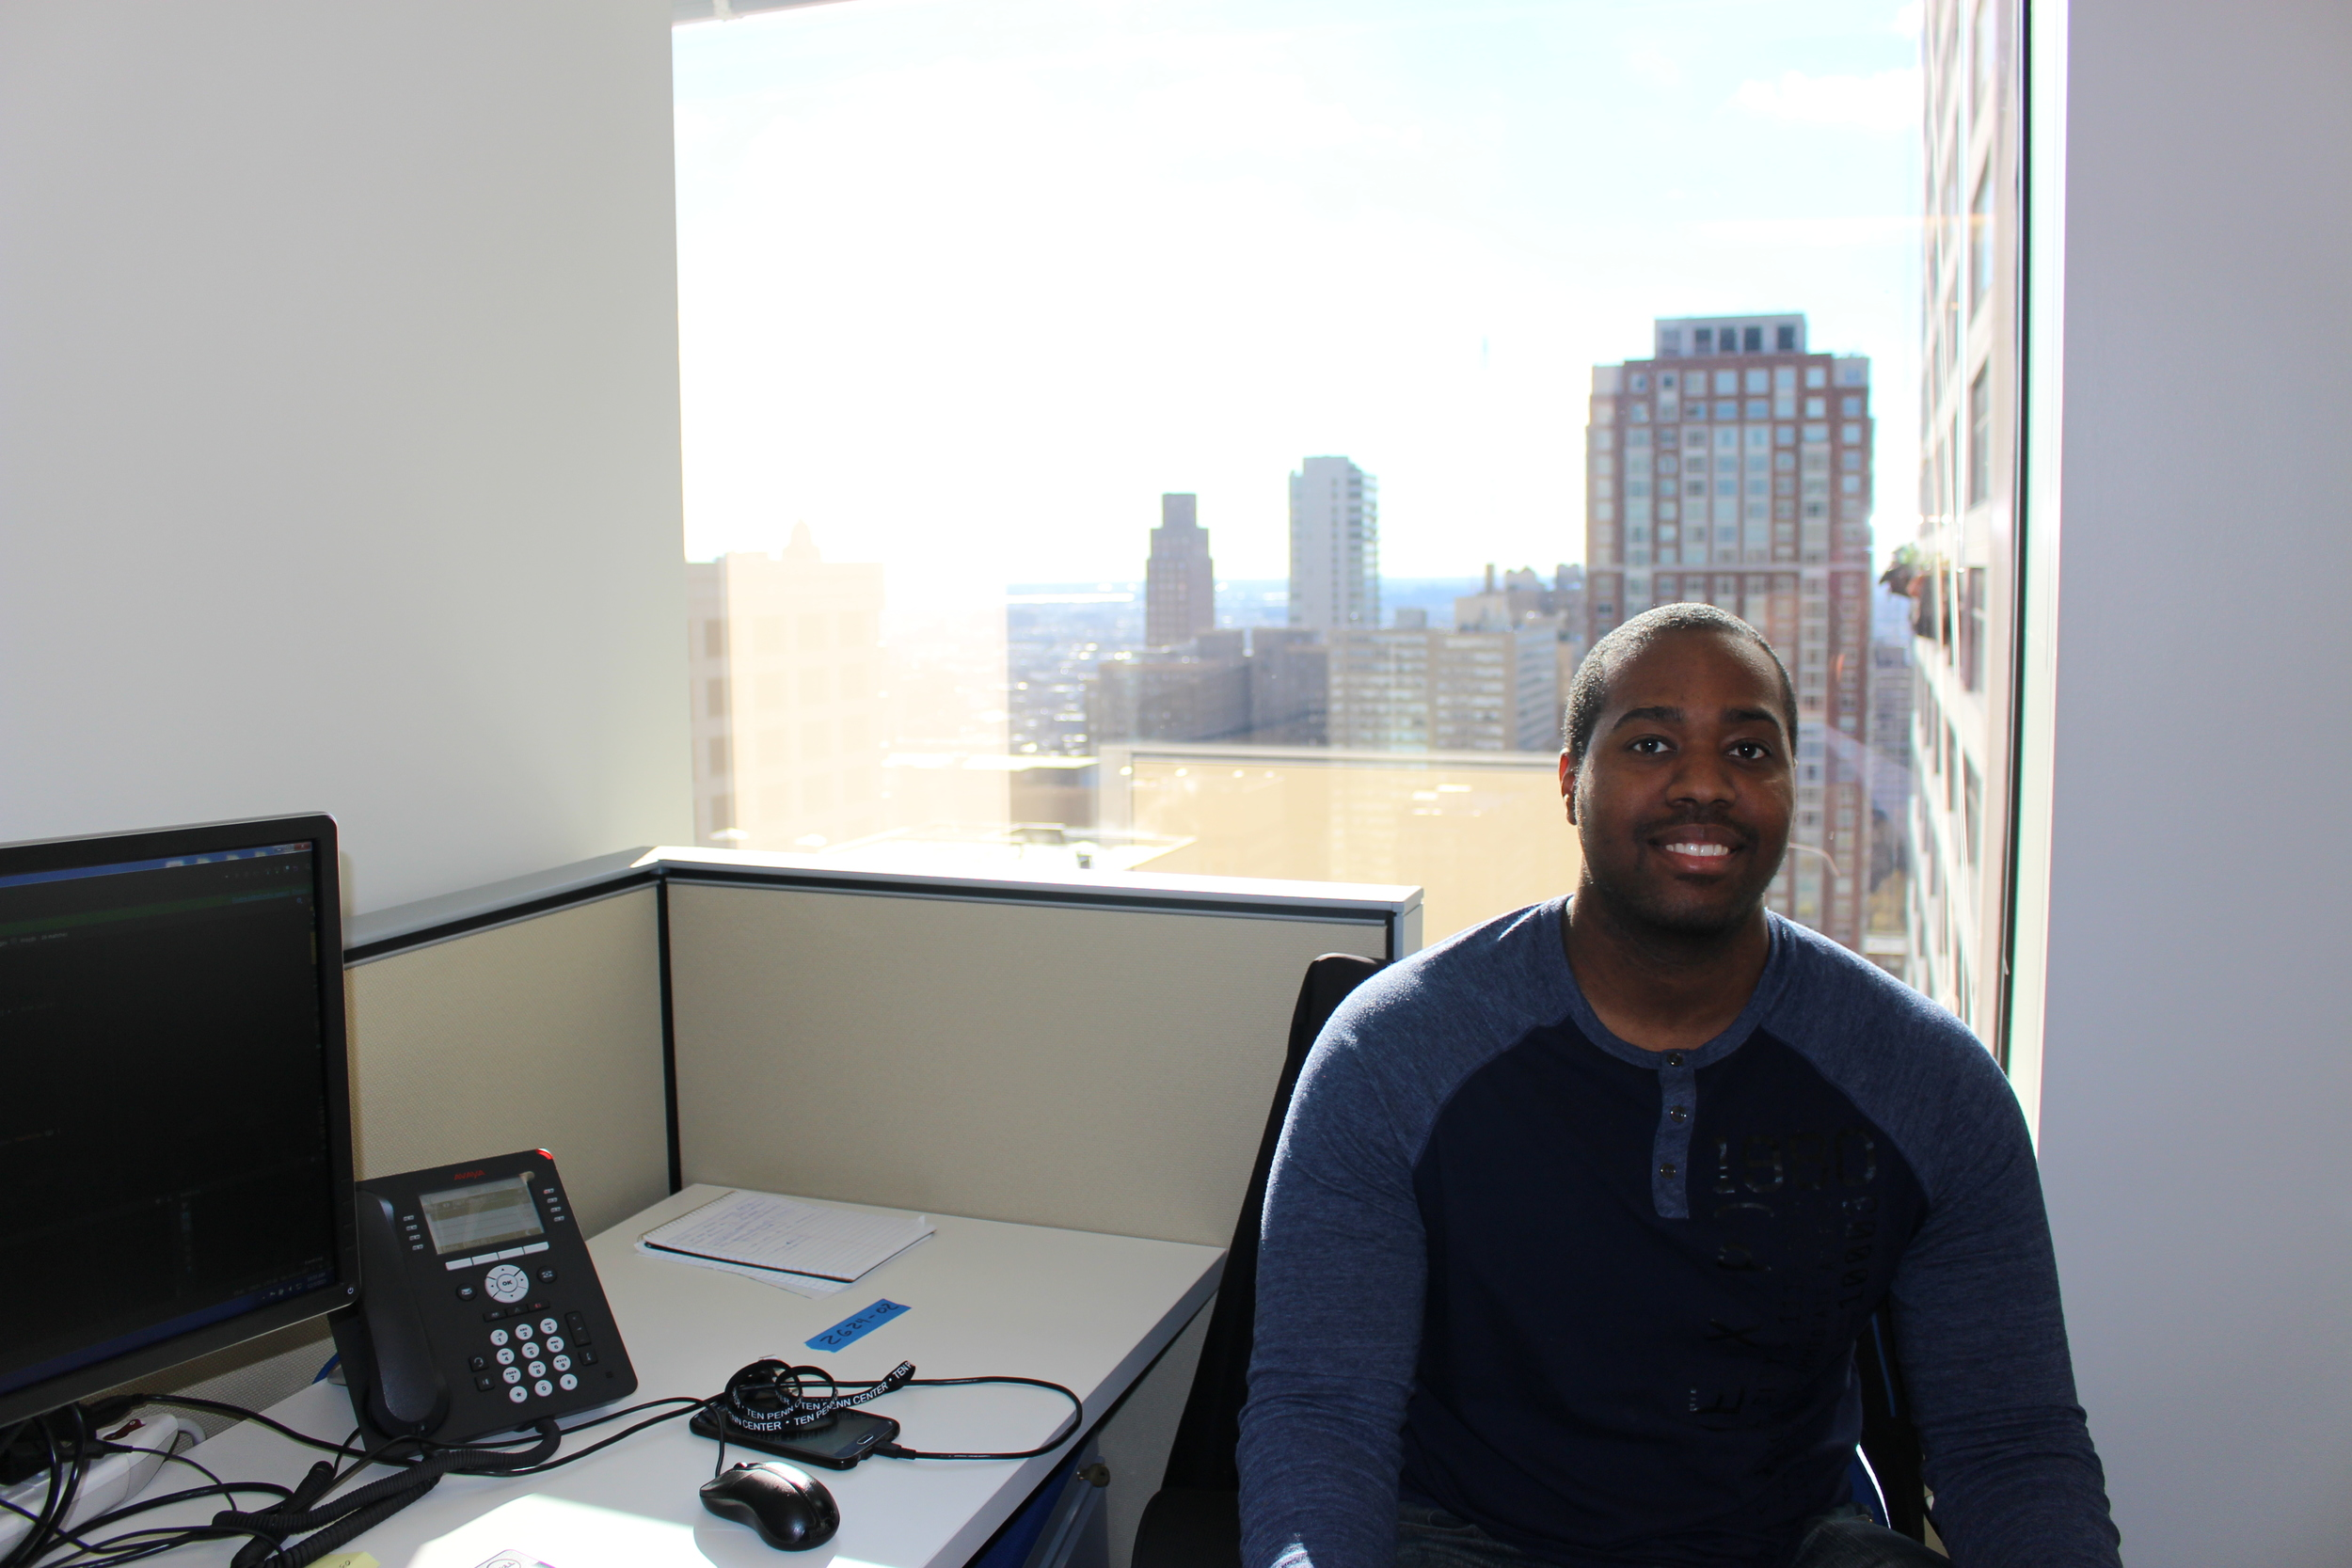 Jason Sanders is a developer in GeoDecisions' Philadelphia office.